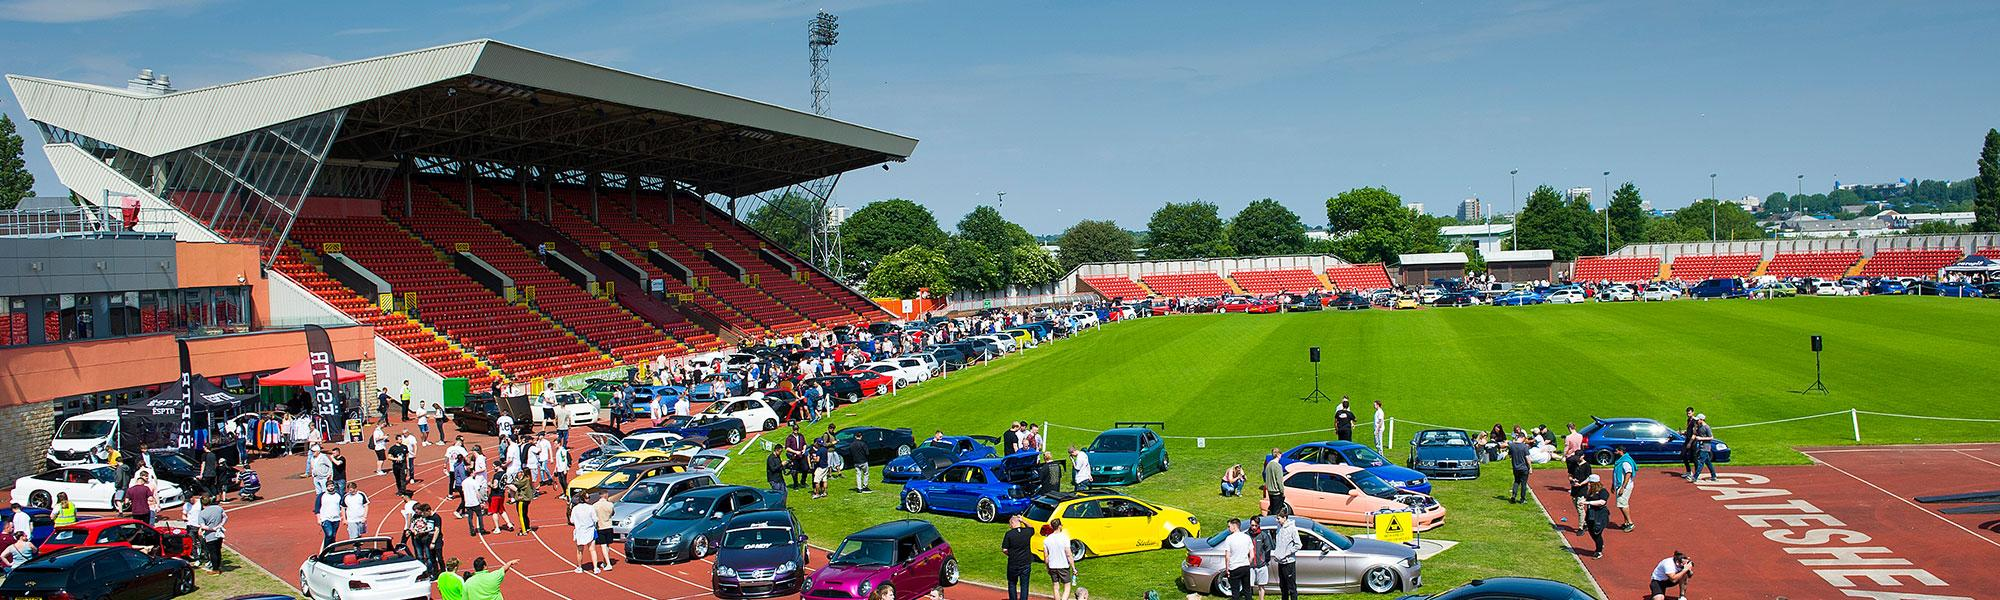 Gateshead International Stadium header